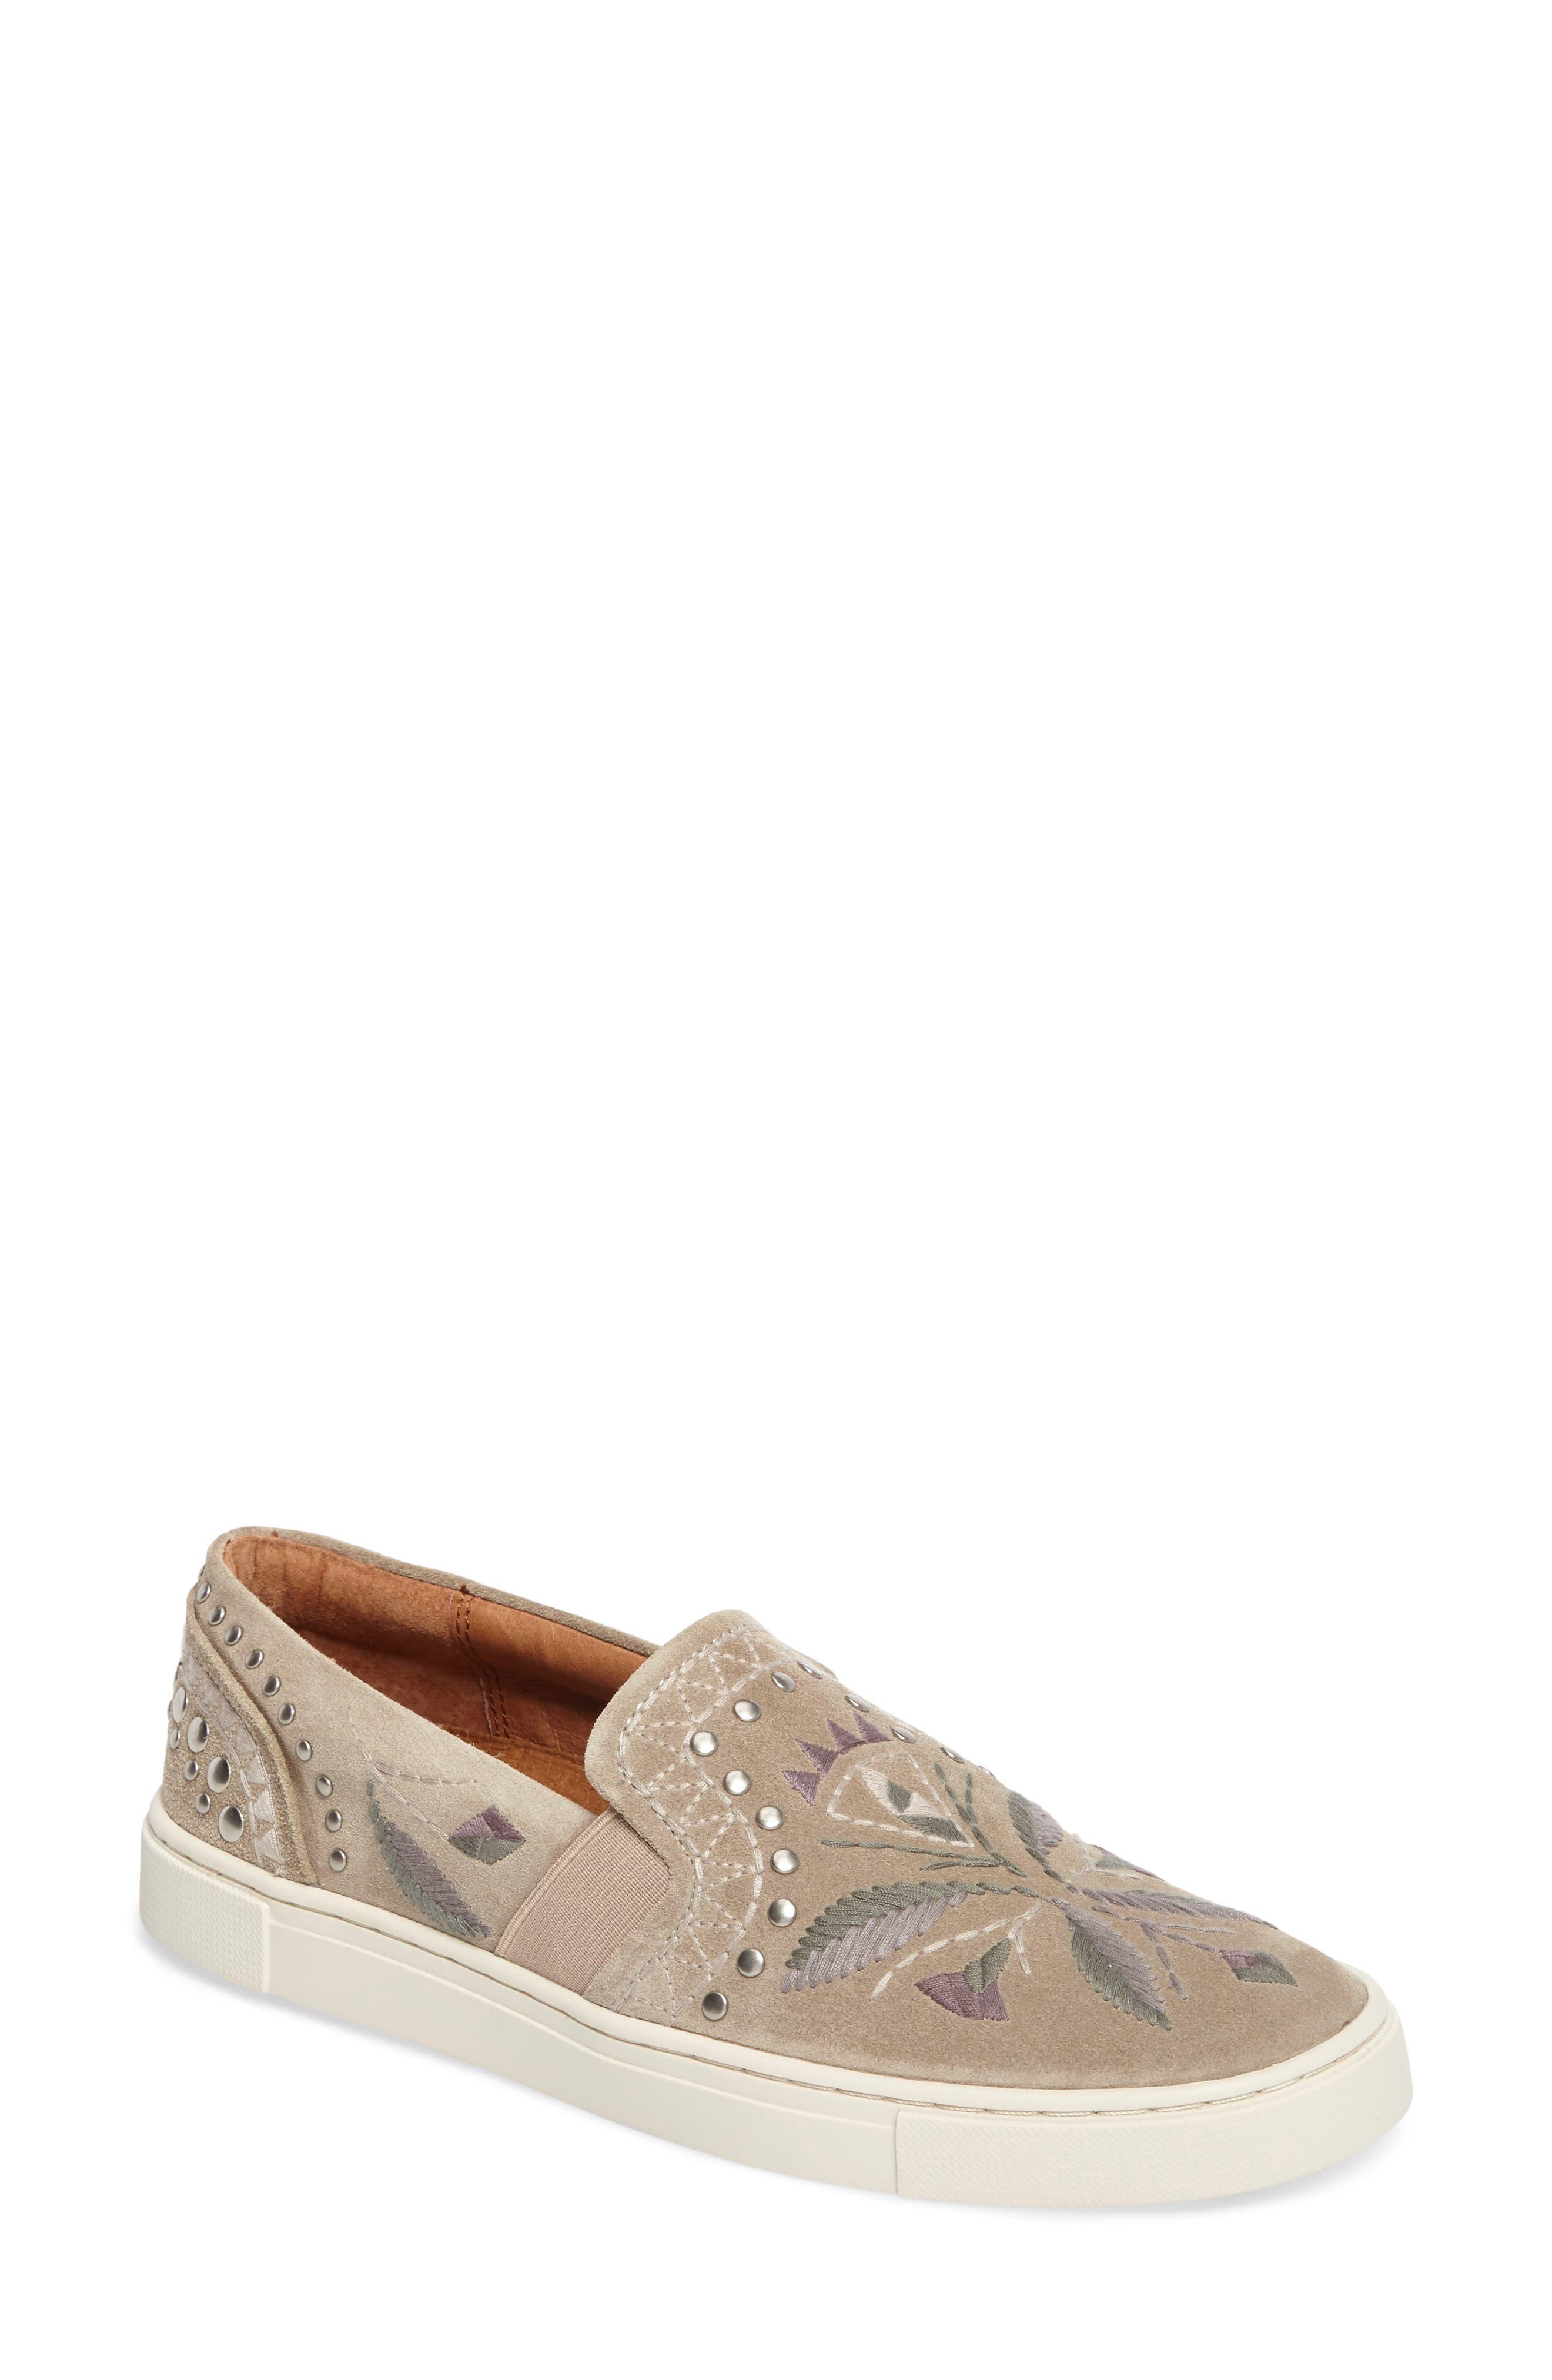 Frye Ivy Embroidered Slip-On Sneaker (Women)